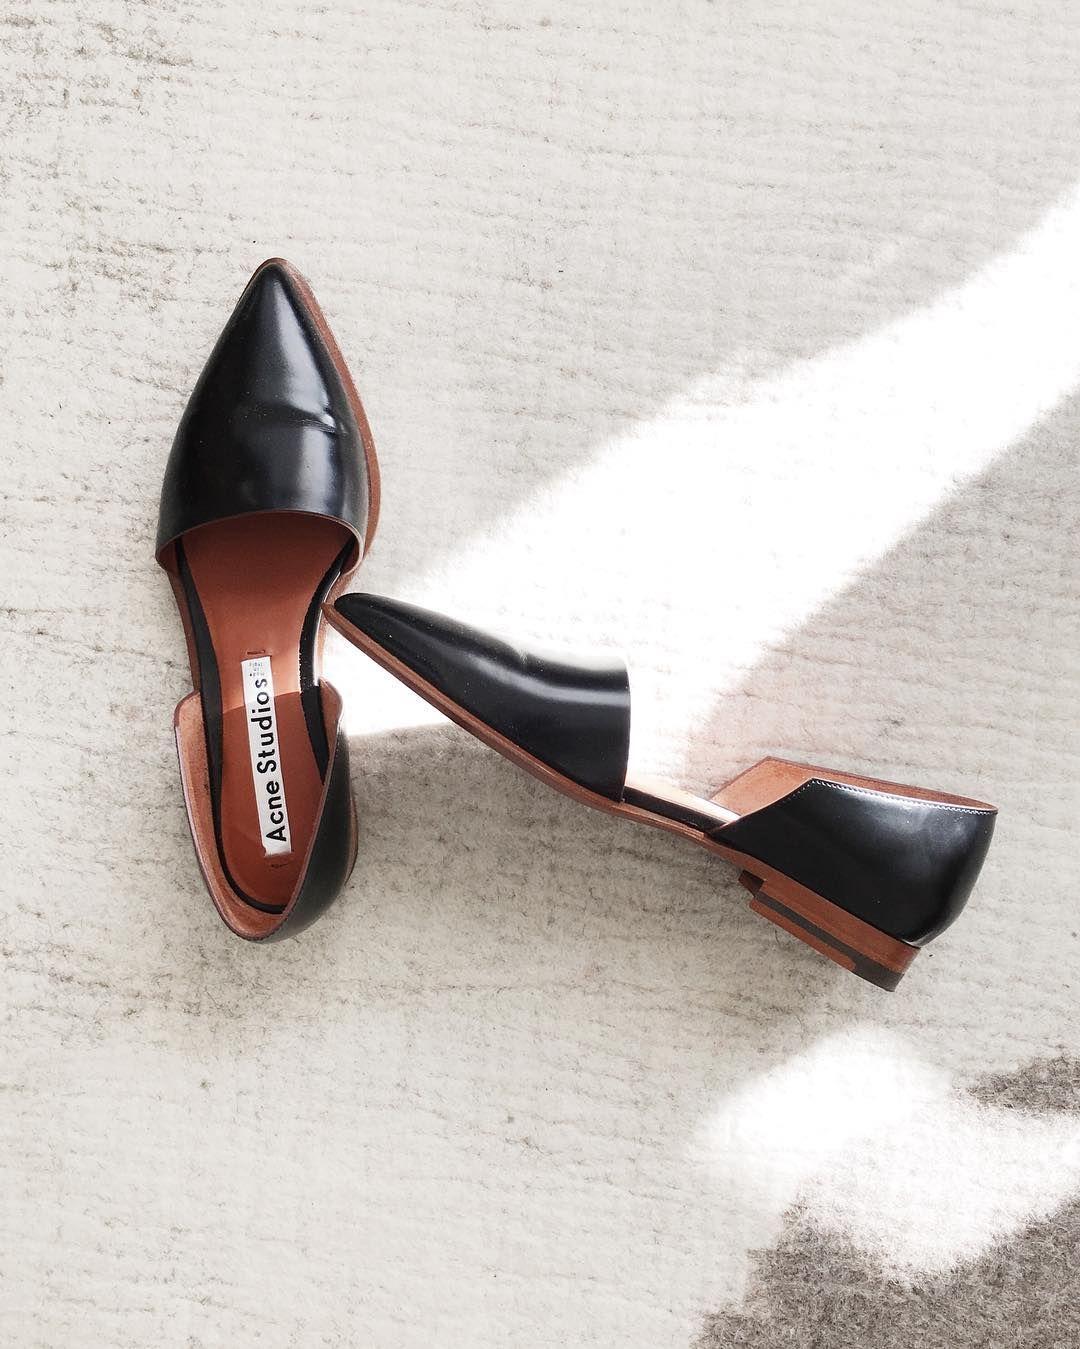 8ab23bc37 Sapato maravilhoso! Minimalista, moderno, pra ter pra vida toda ...